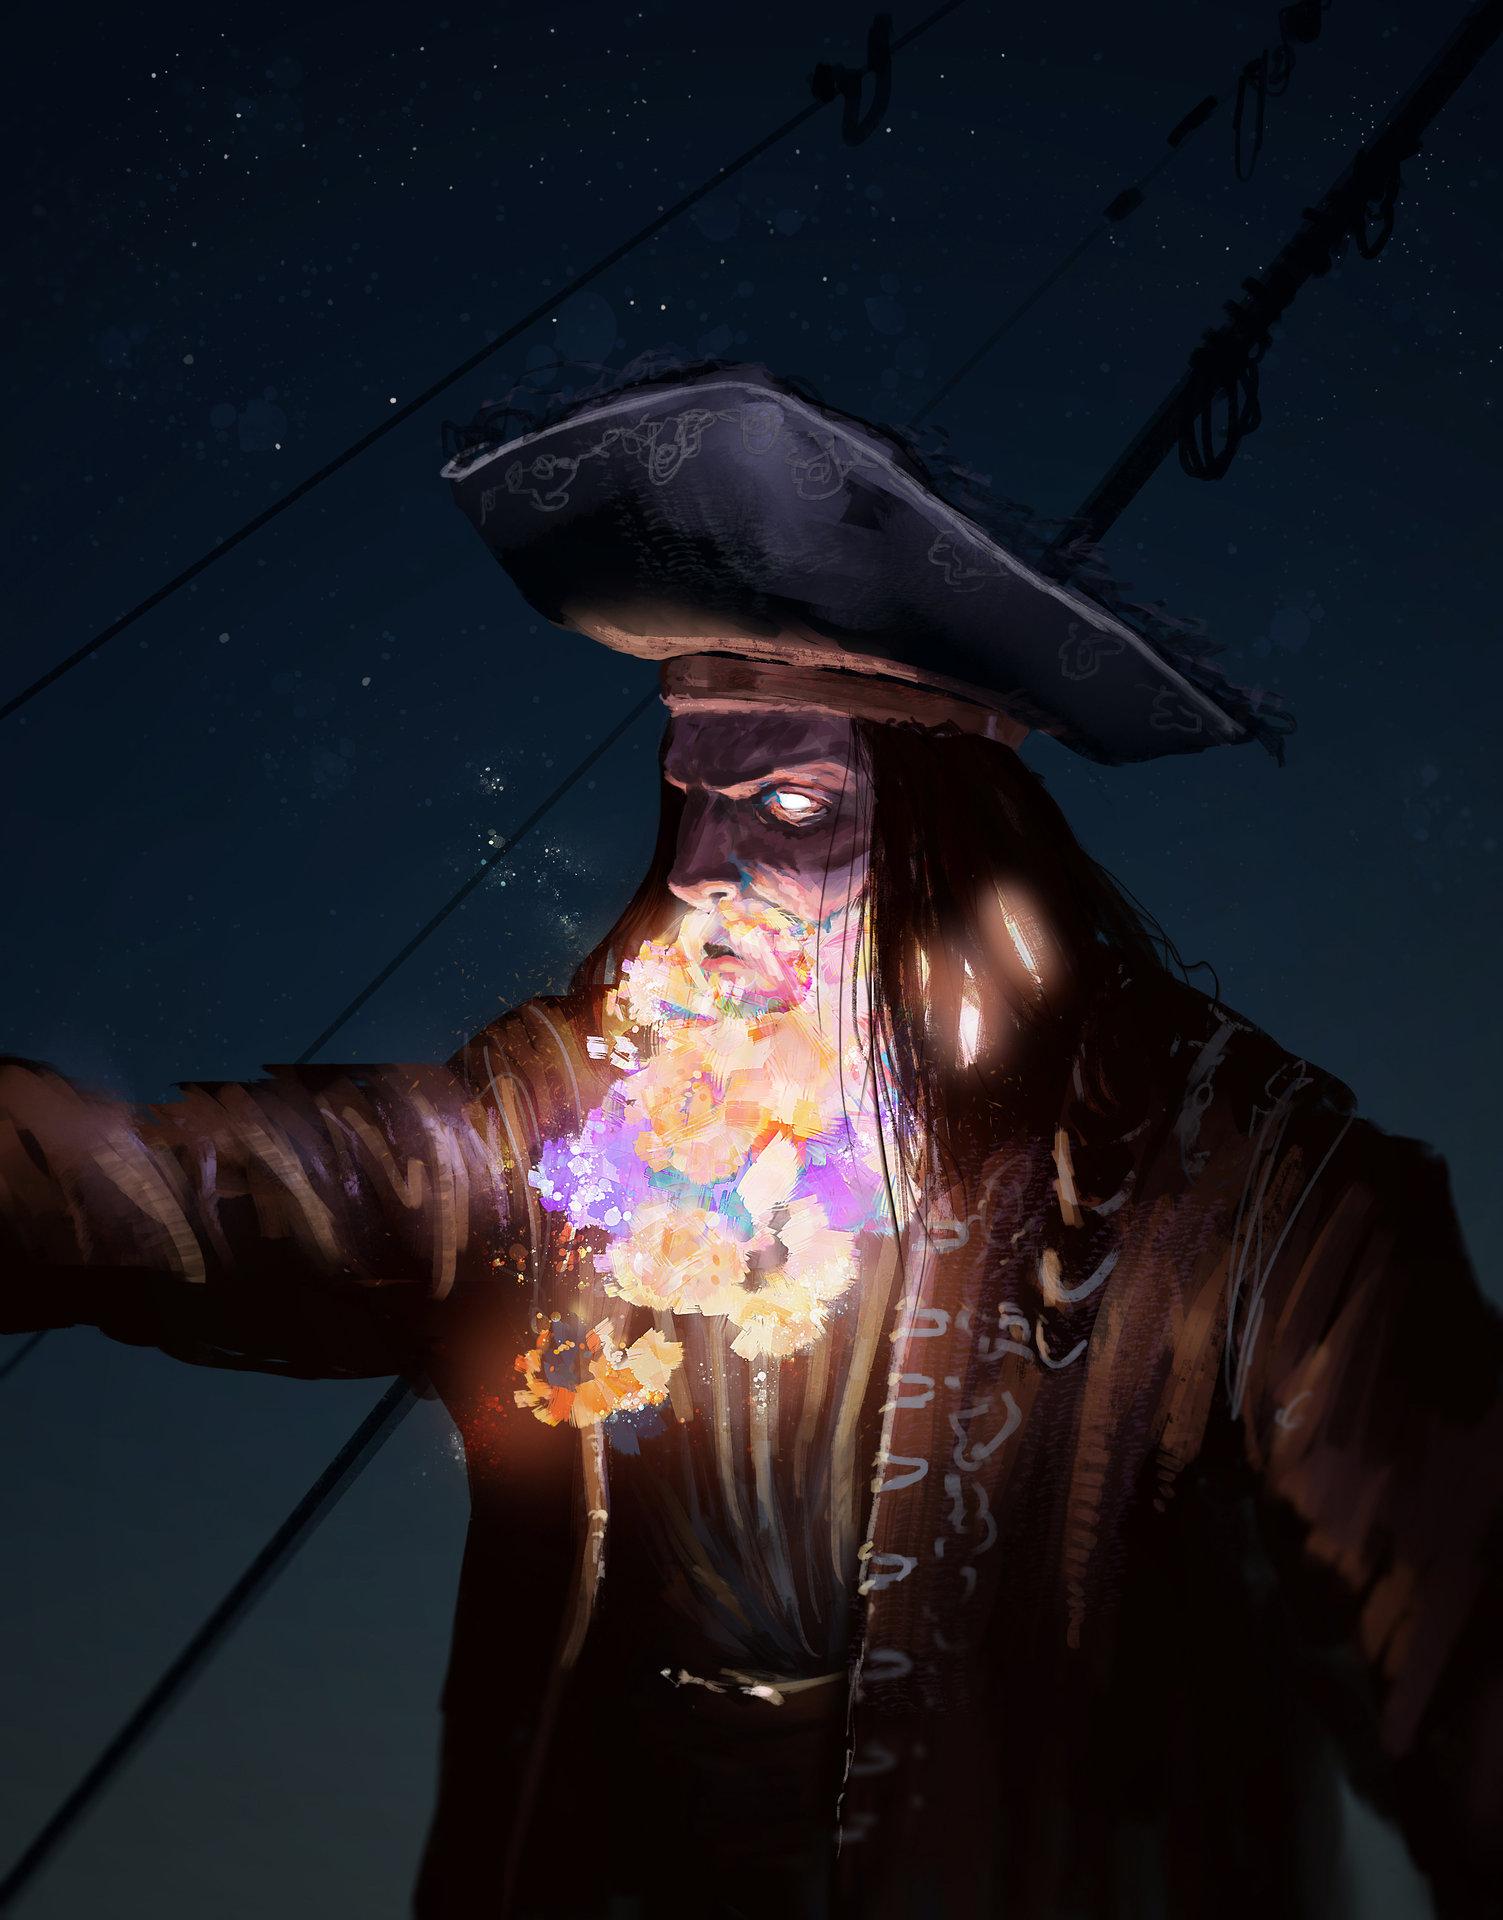 Chenthooran nambiarooran pirate wizard 4